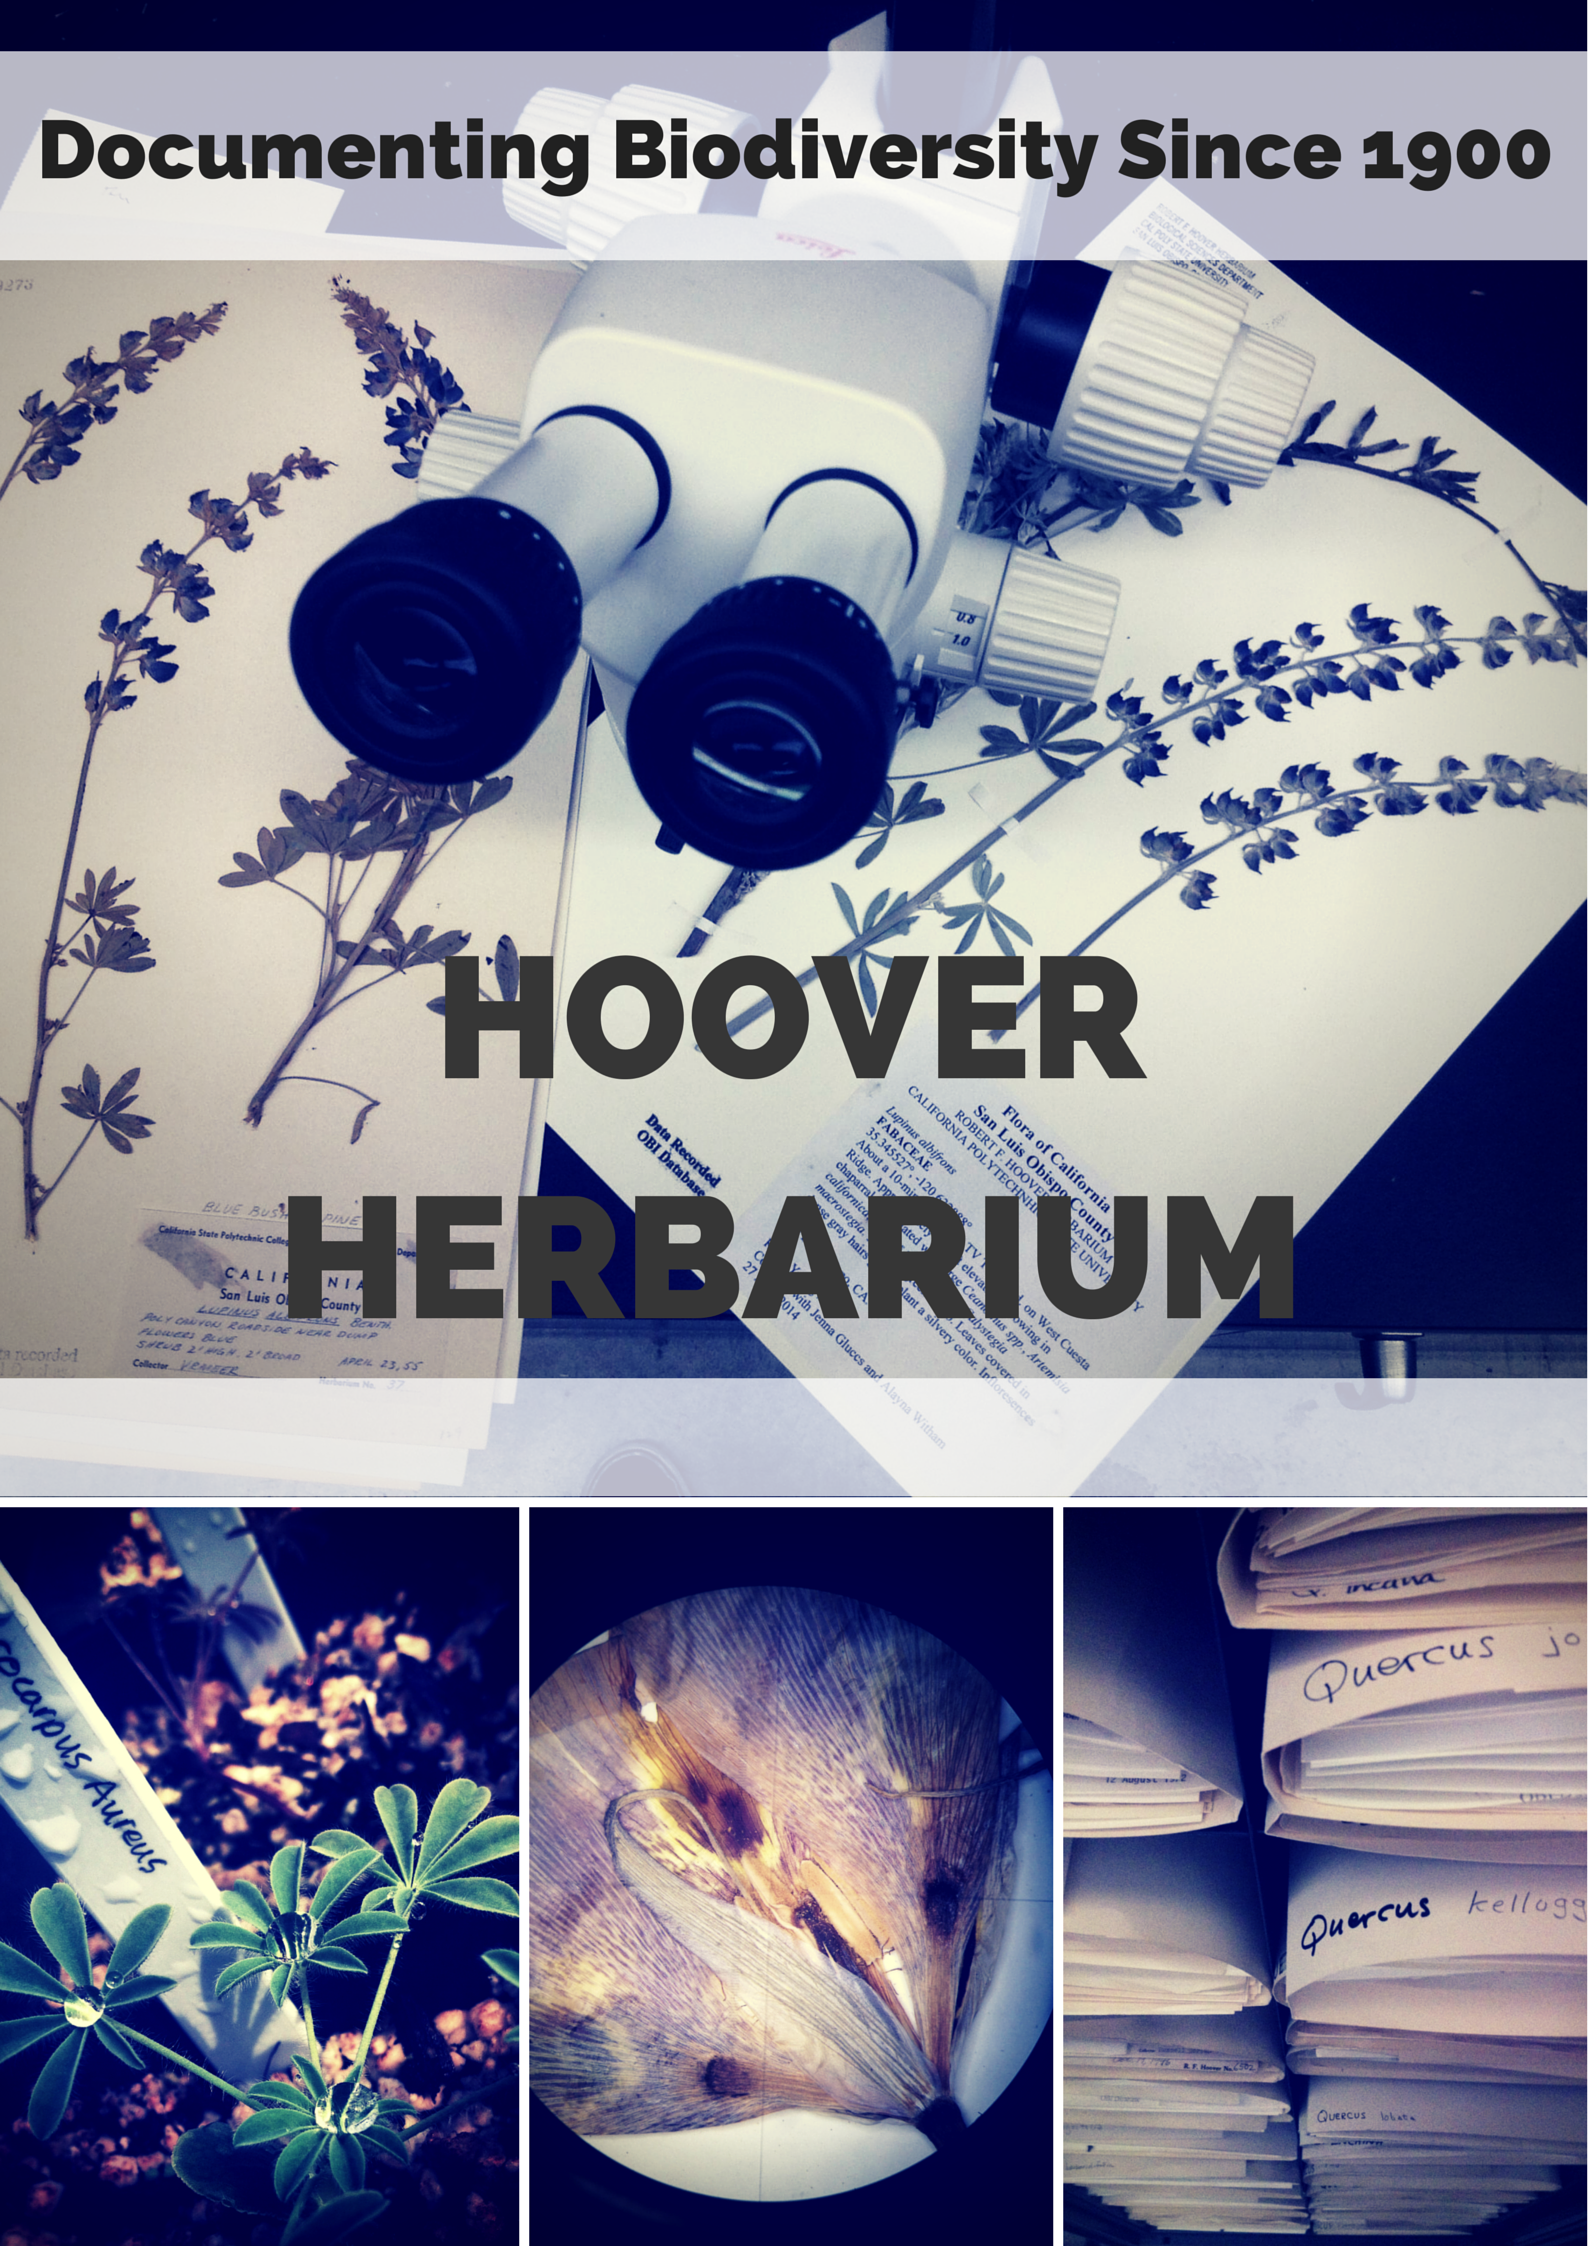 My herbarium poster design